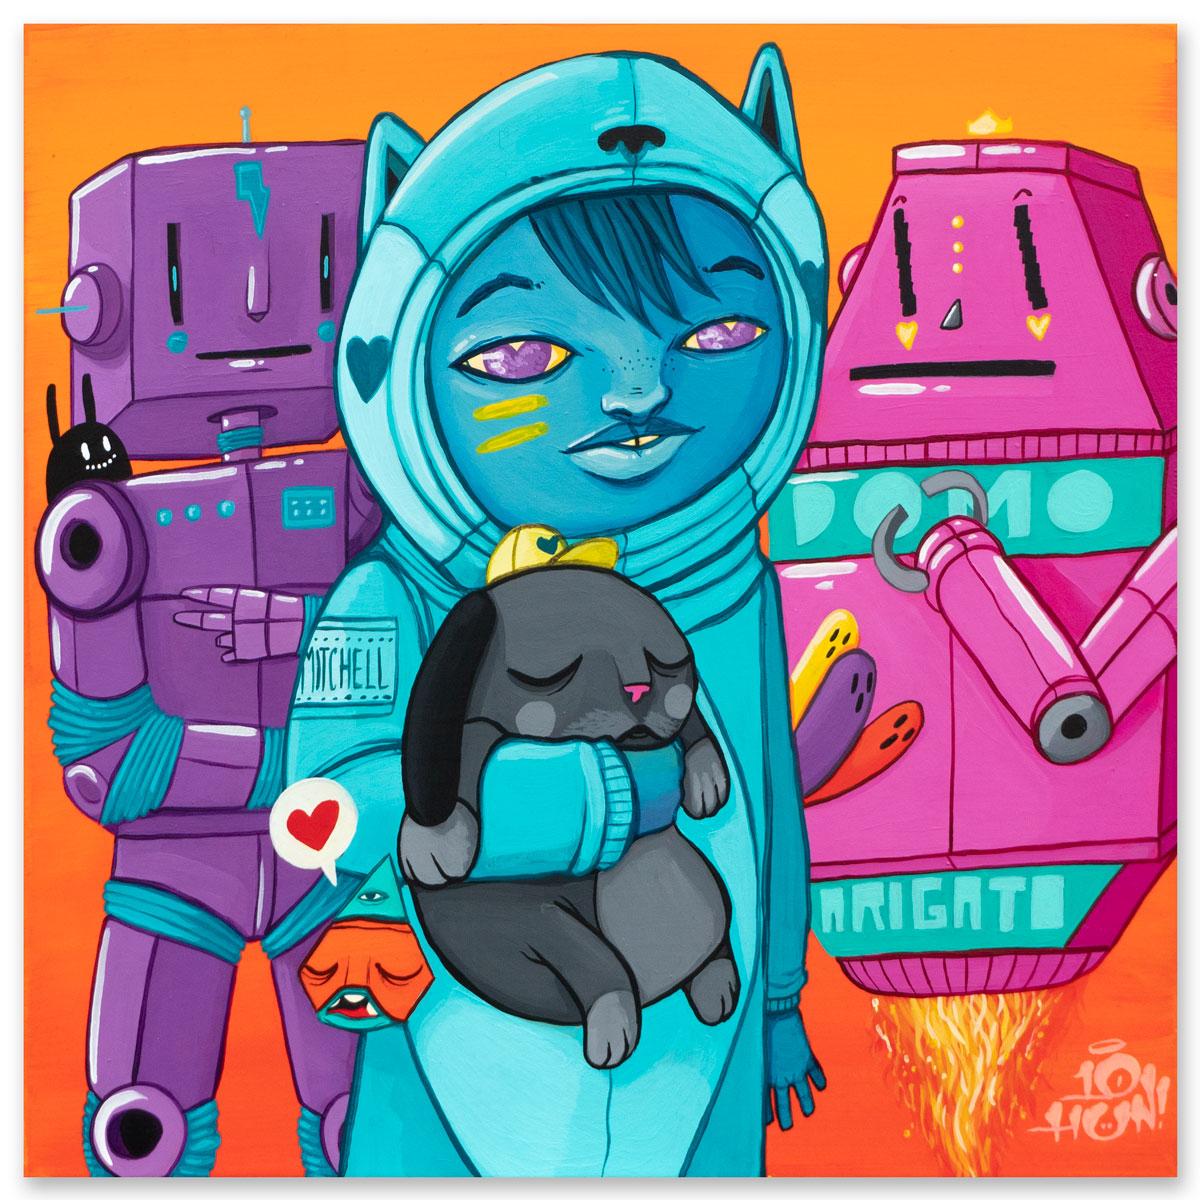 Mitchell's-Robots-1SQUARE.jpg